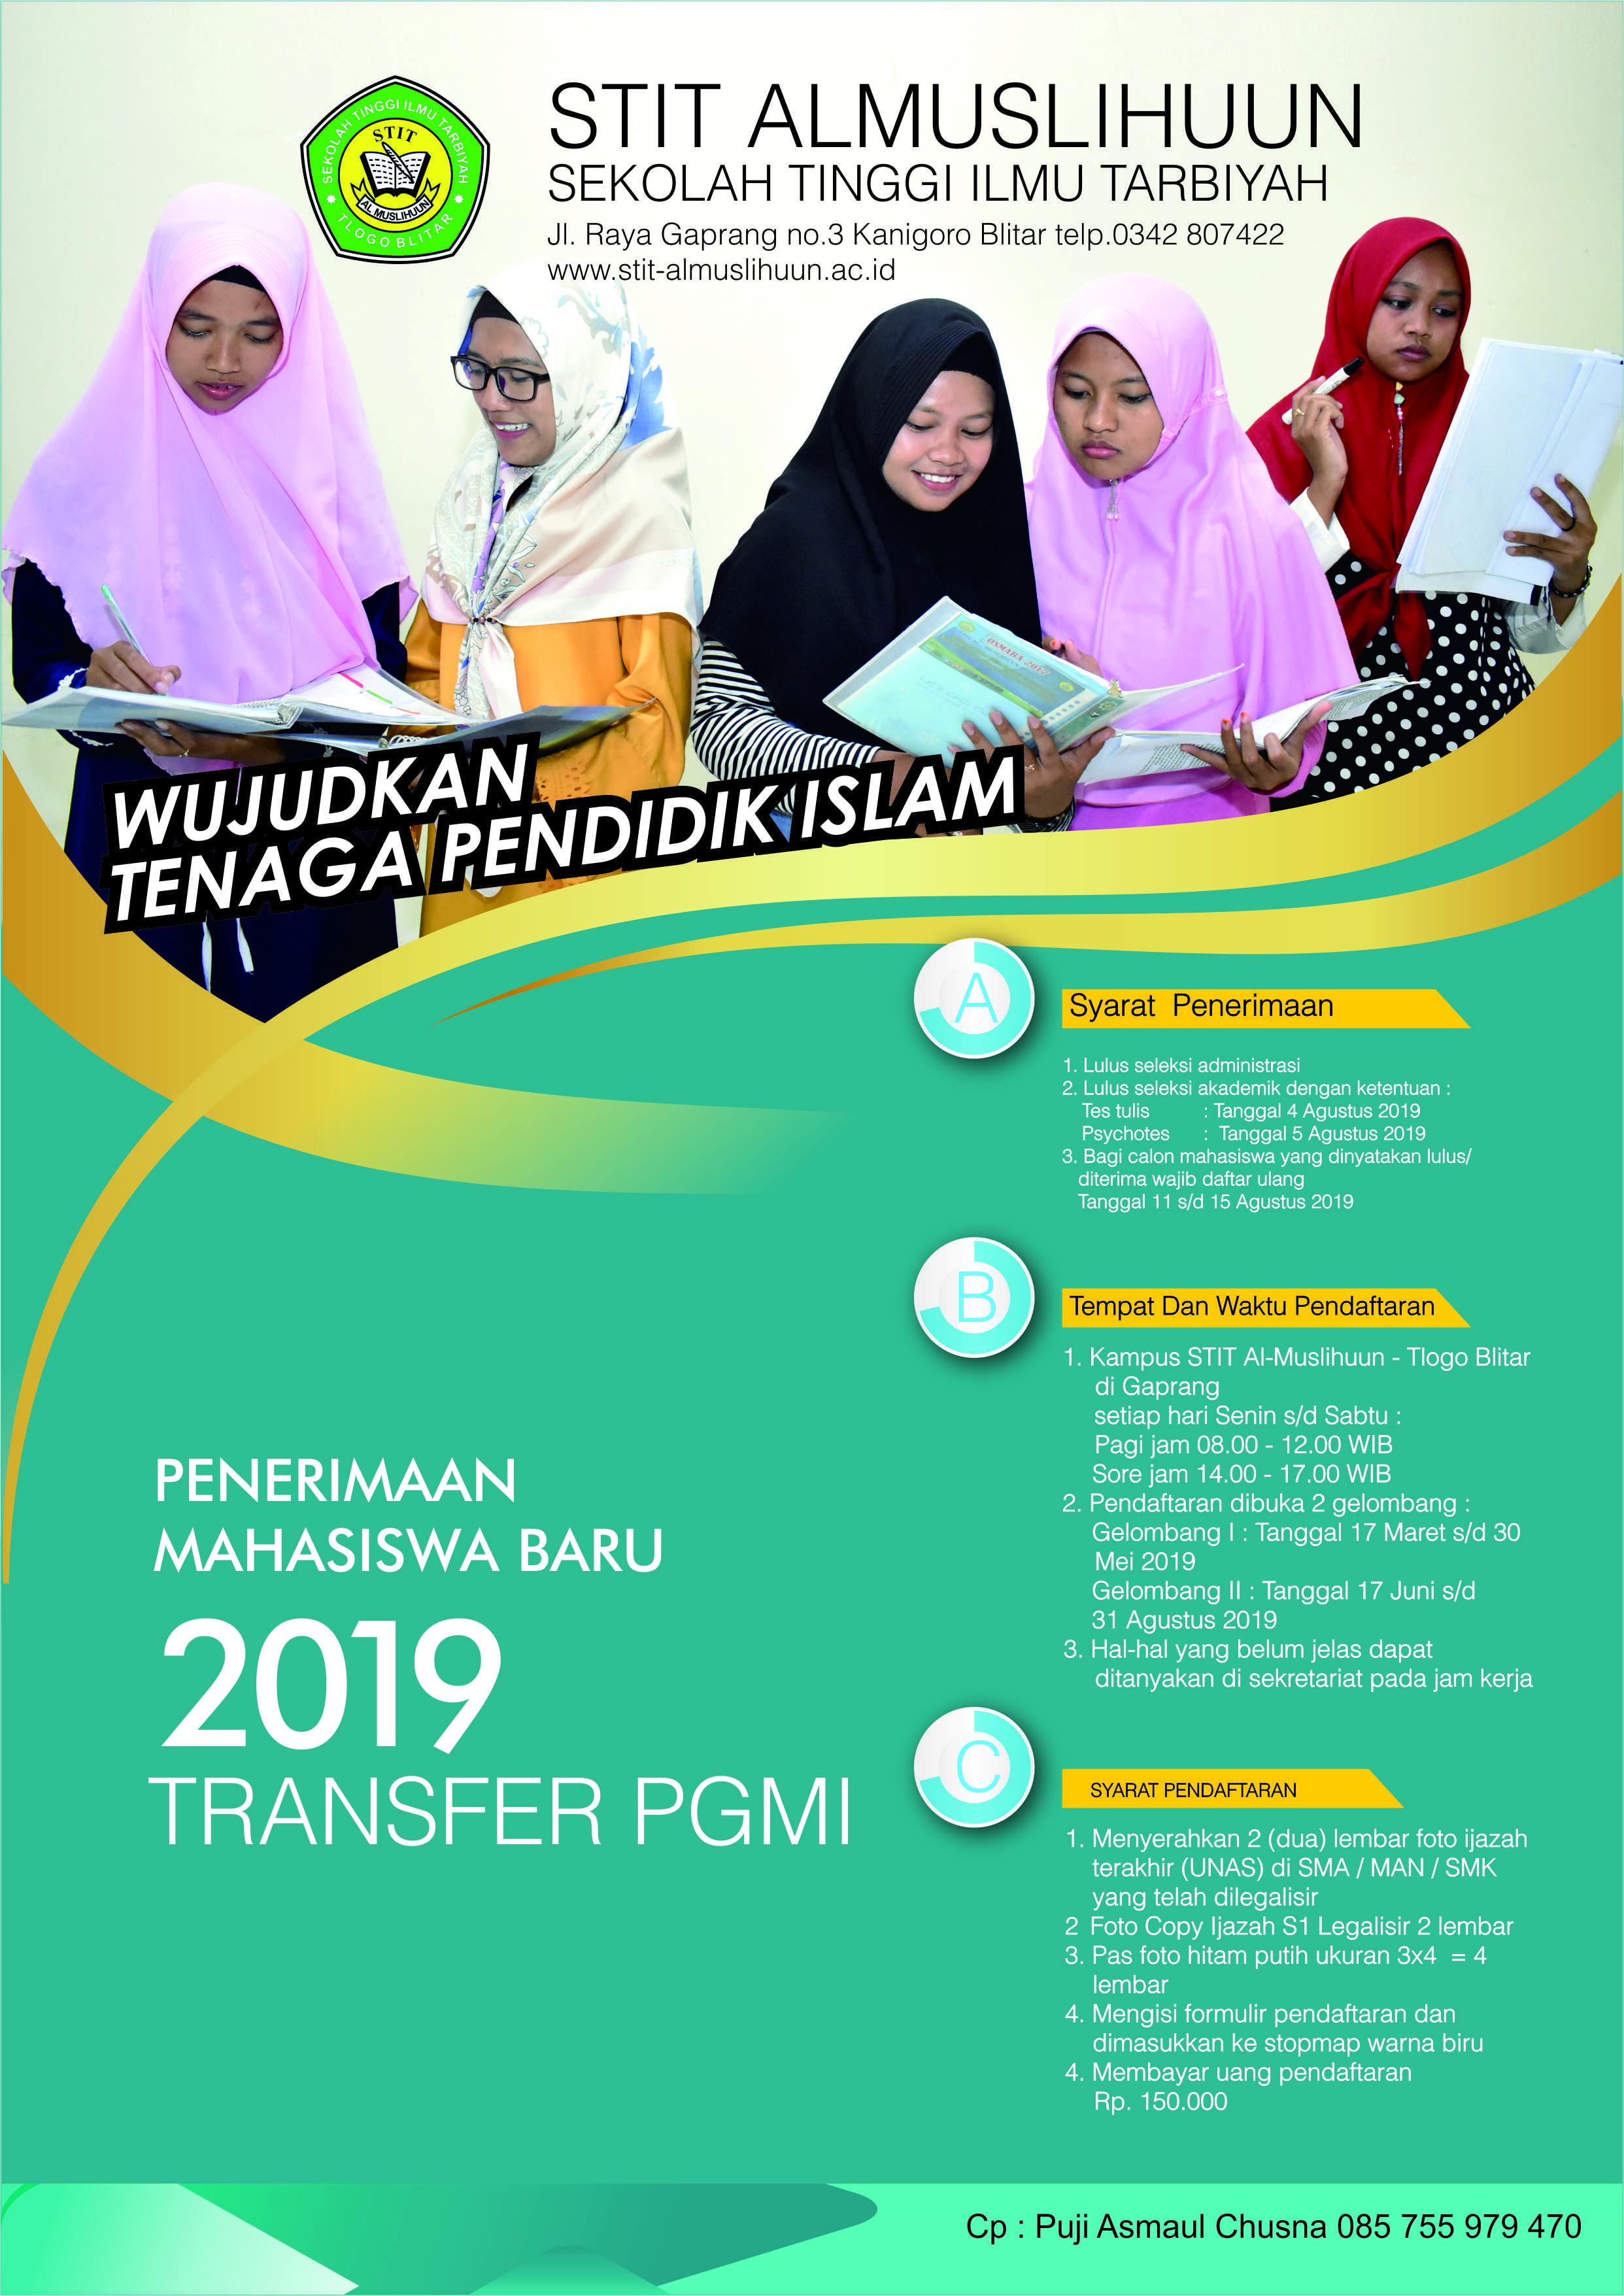 PENGUMUMAN PENDAFTARAN MAHASISWA JALUR TRANSFER